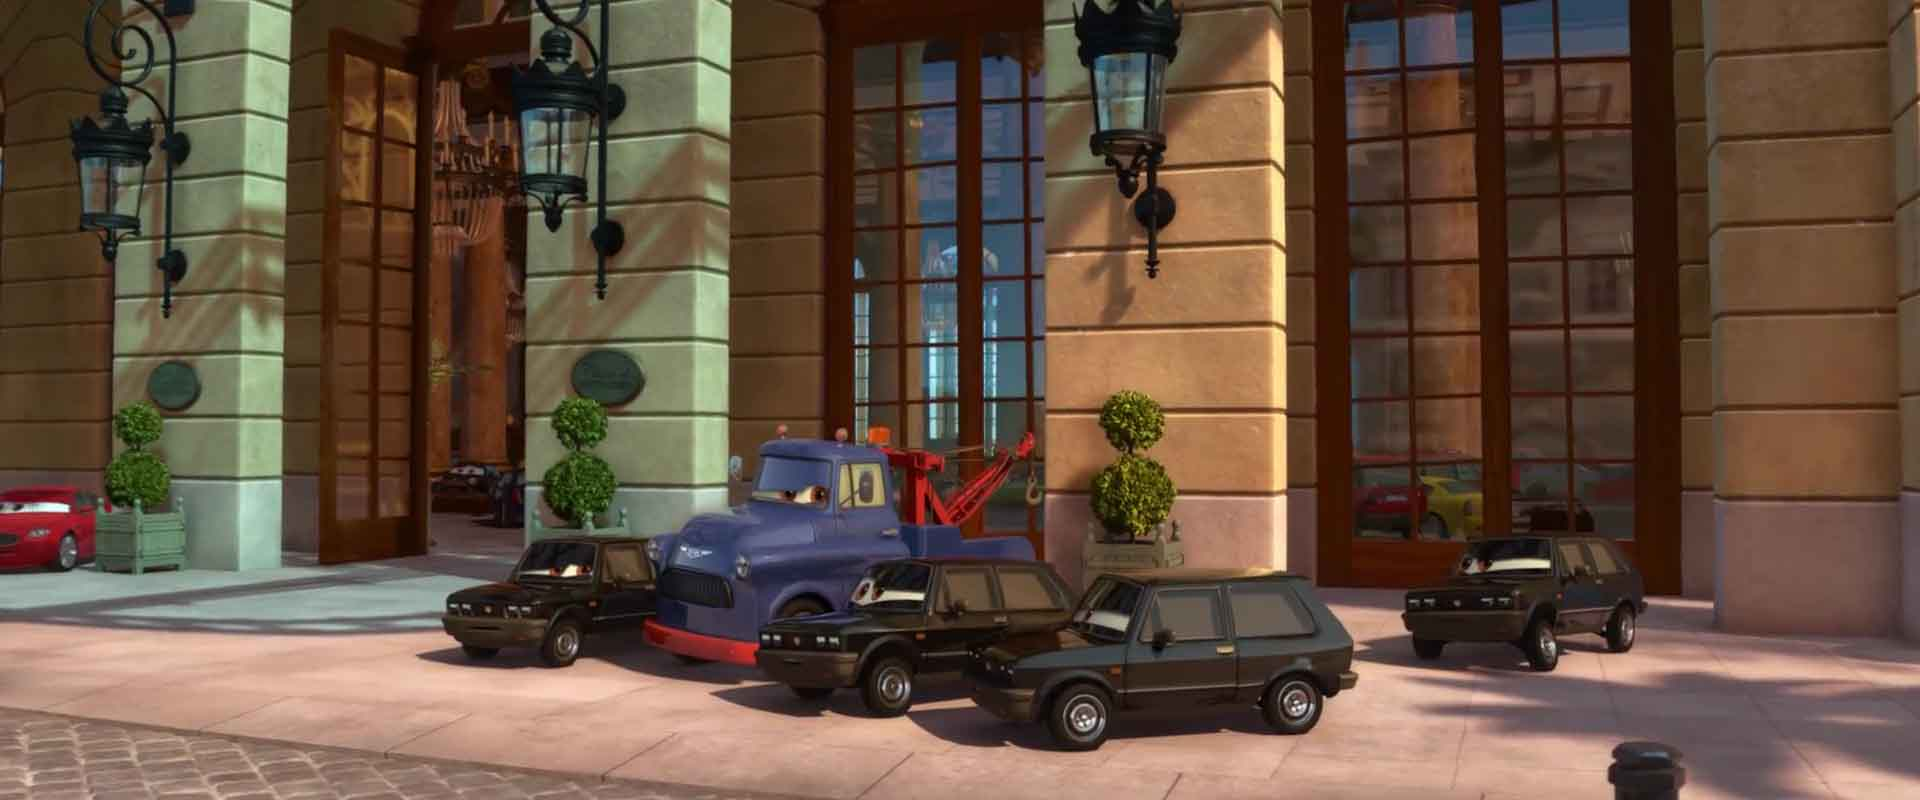 tolga trunkov personnage character pixar disney cars 2